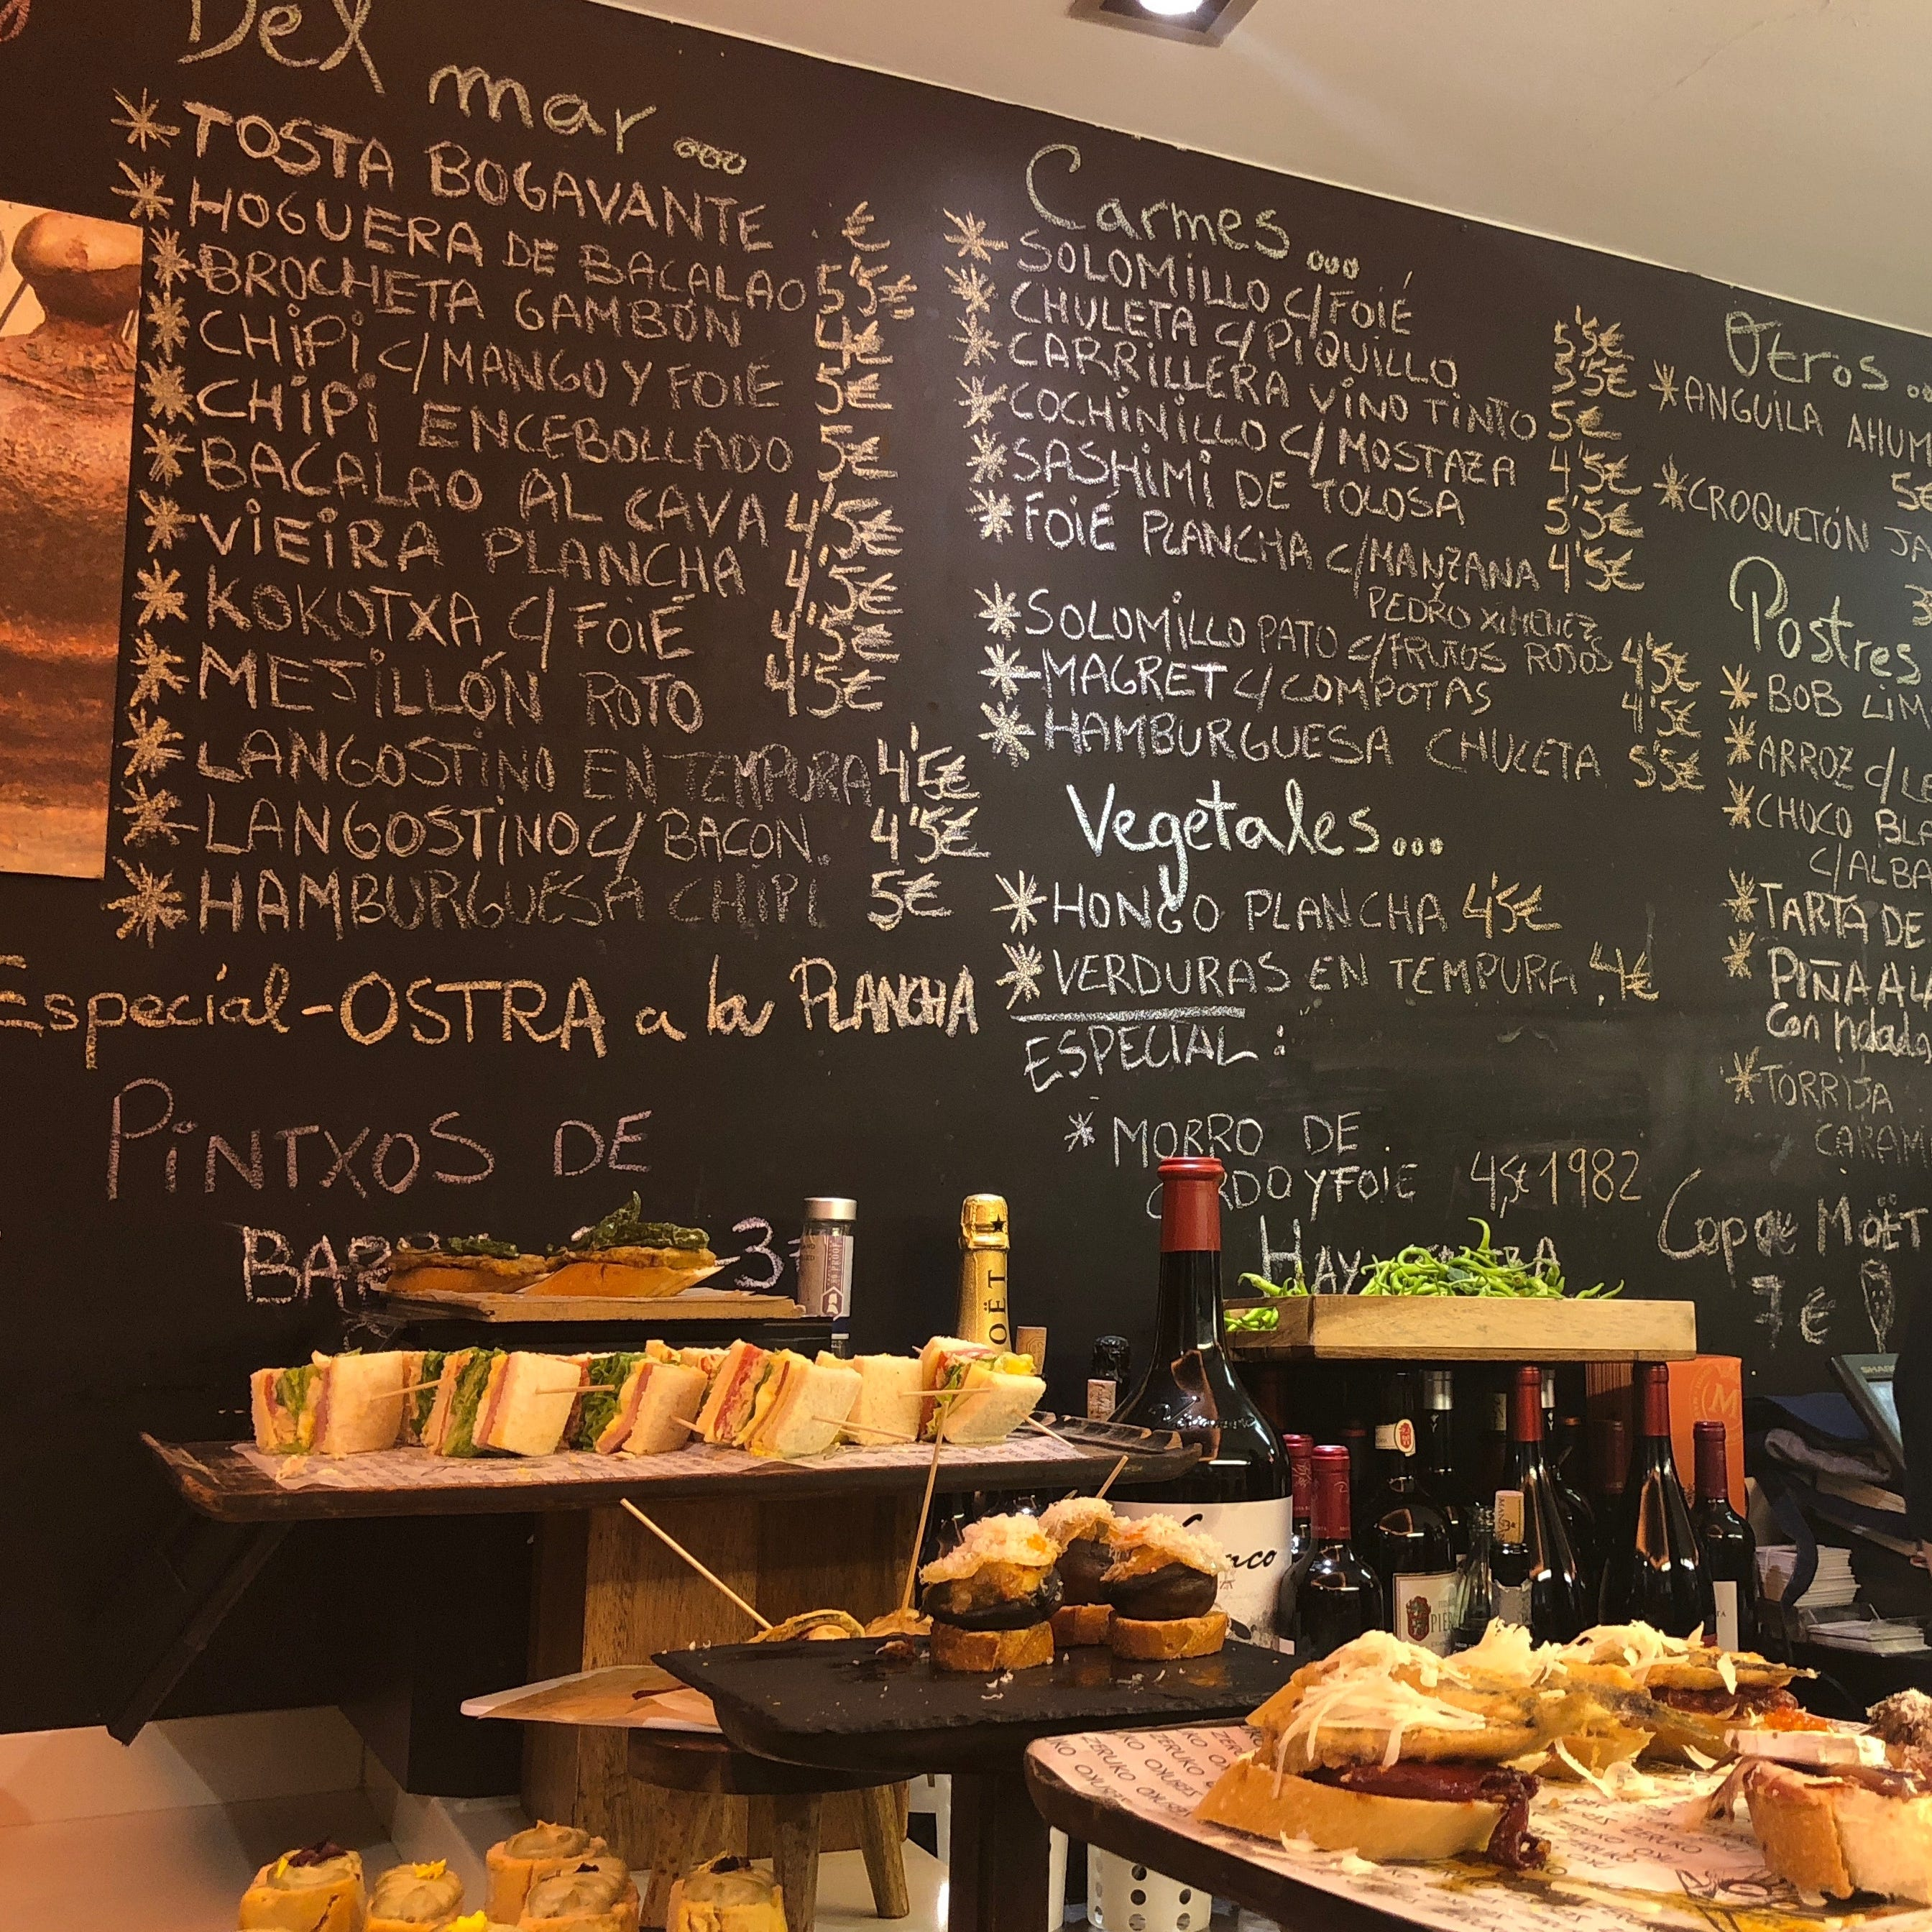 A bar crawl through San Sebastian, Spain, ends in broken glass and questions